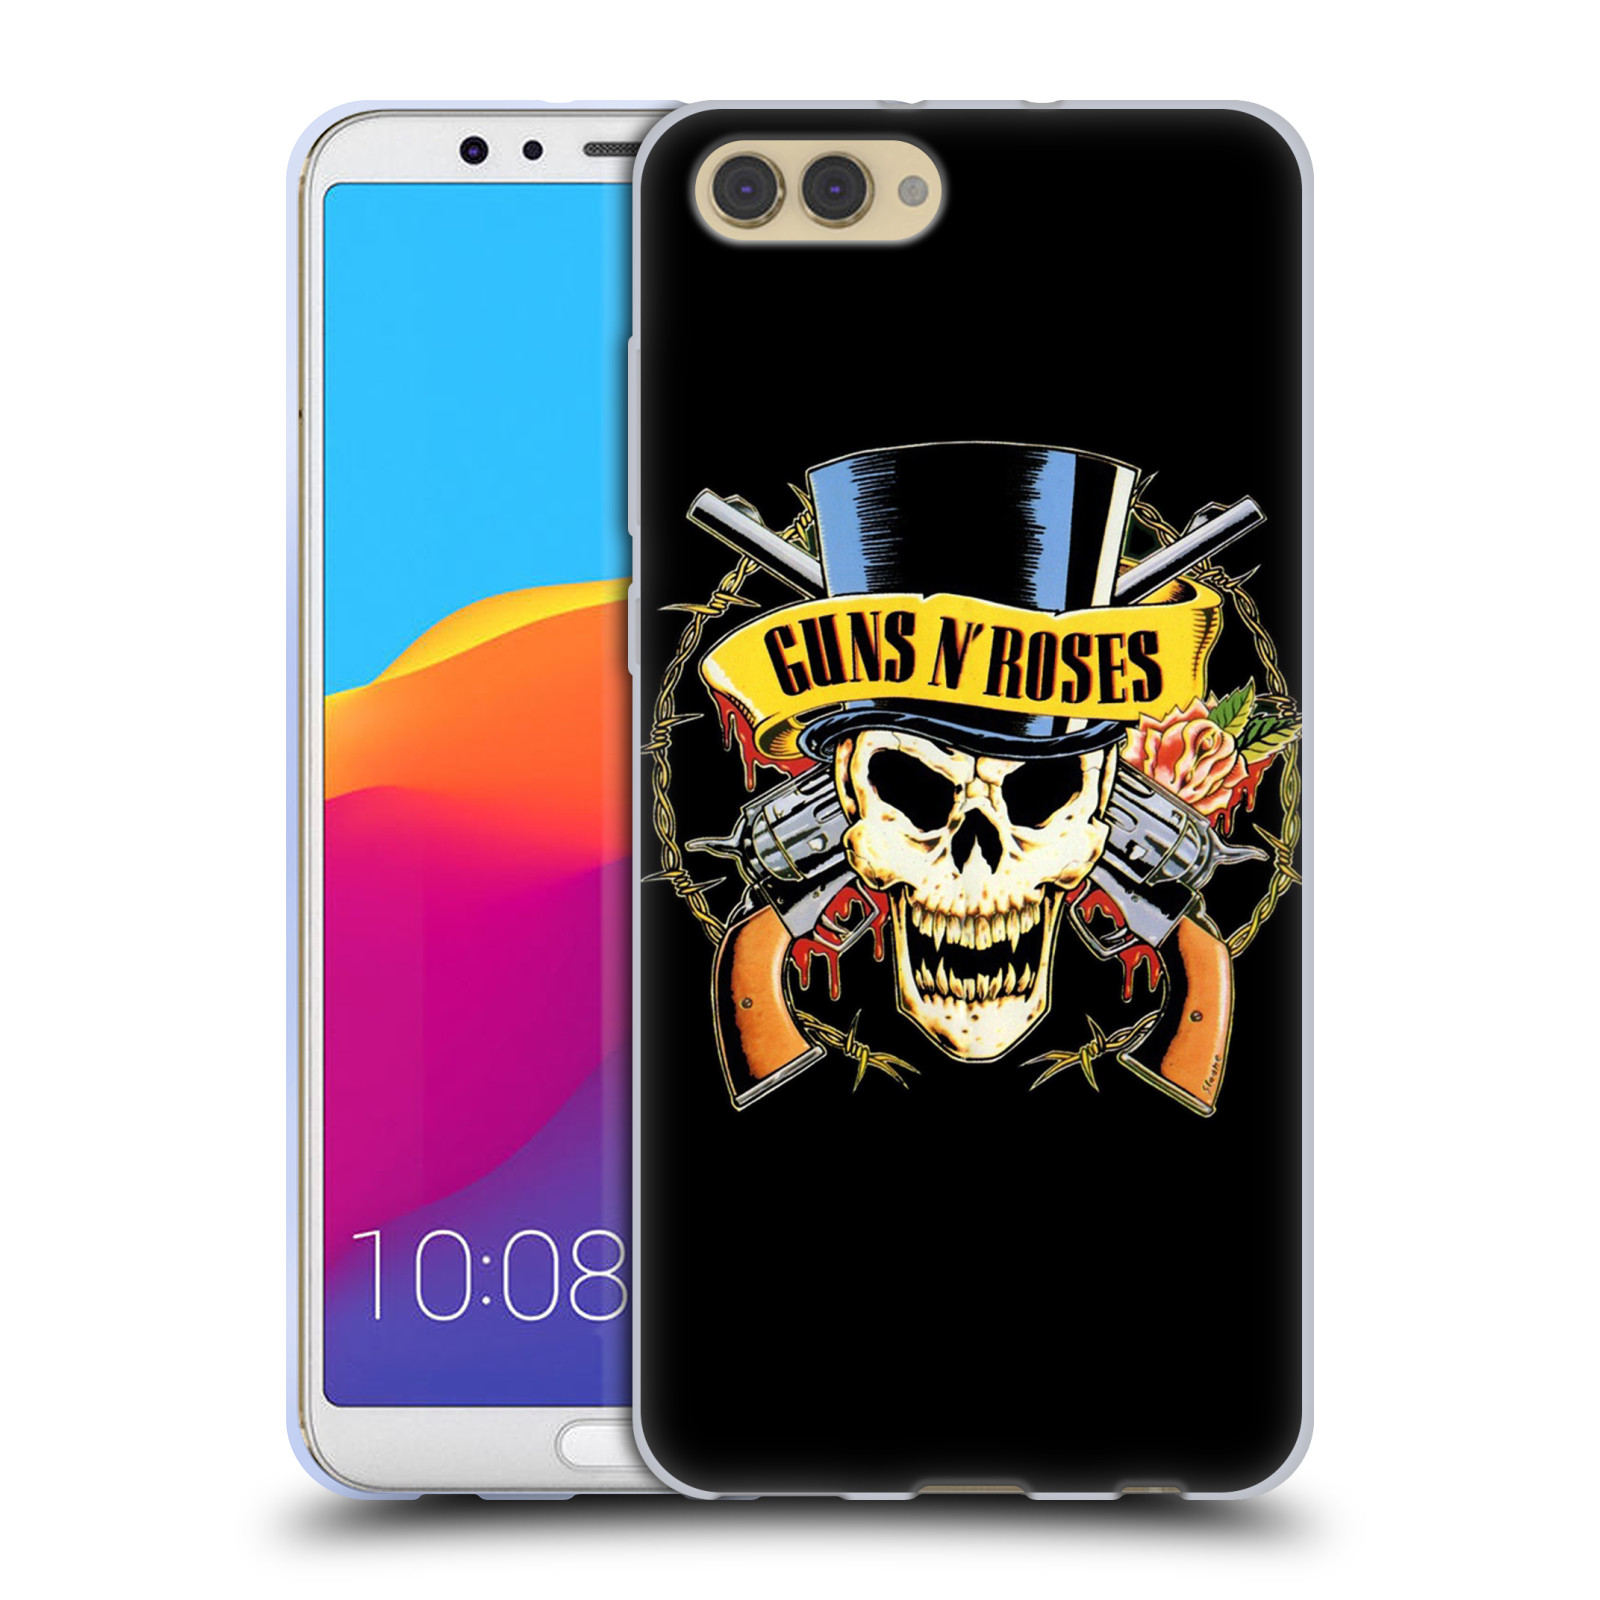 Silikonové pouzdro na mobil Honor View 10 - Head Case - Guns N' Roses - Lebka